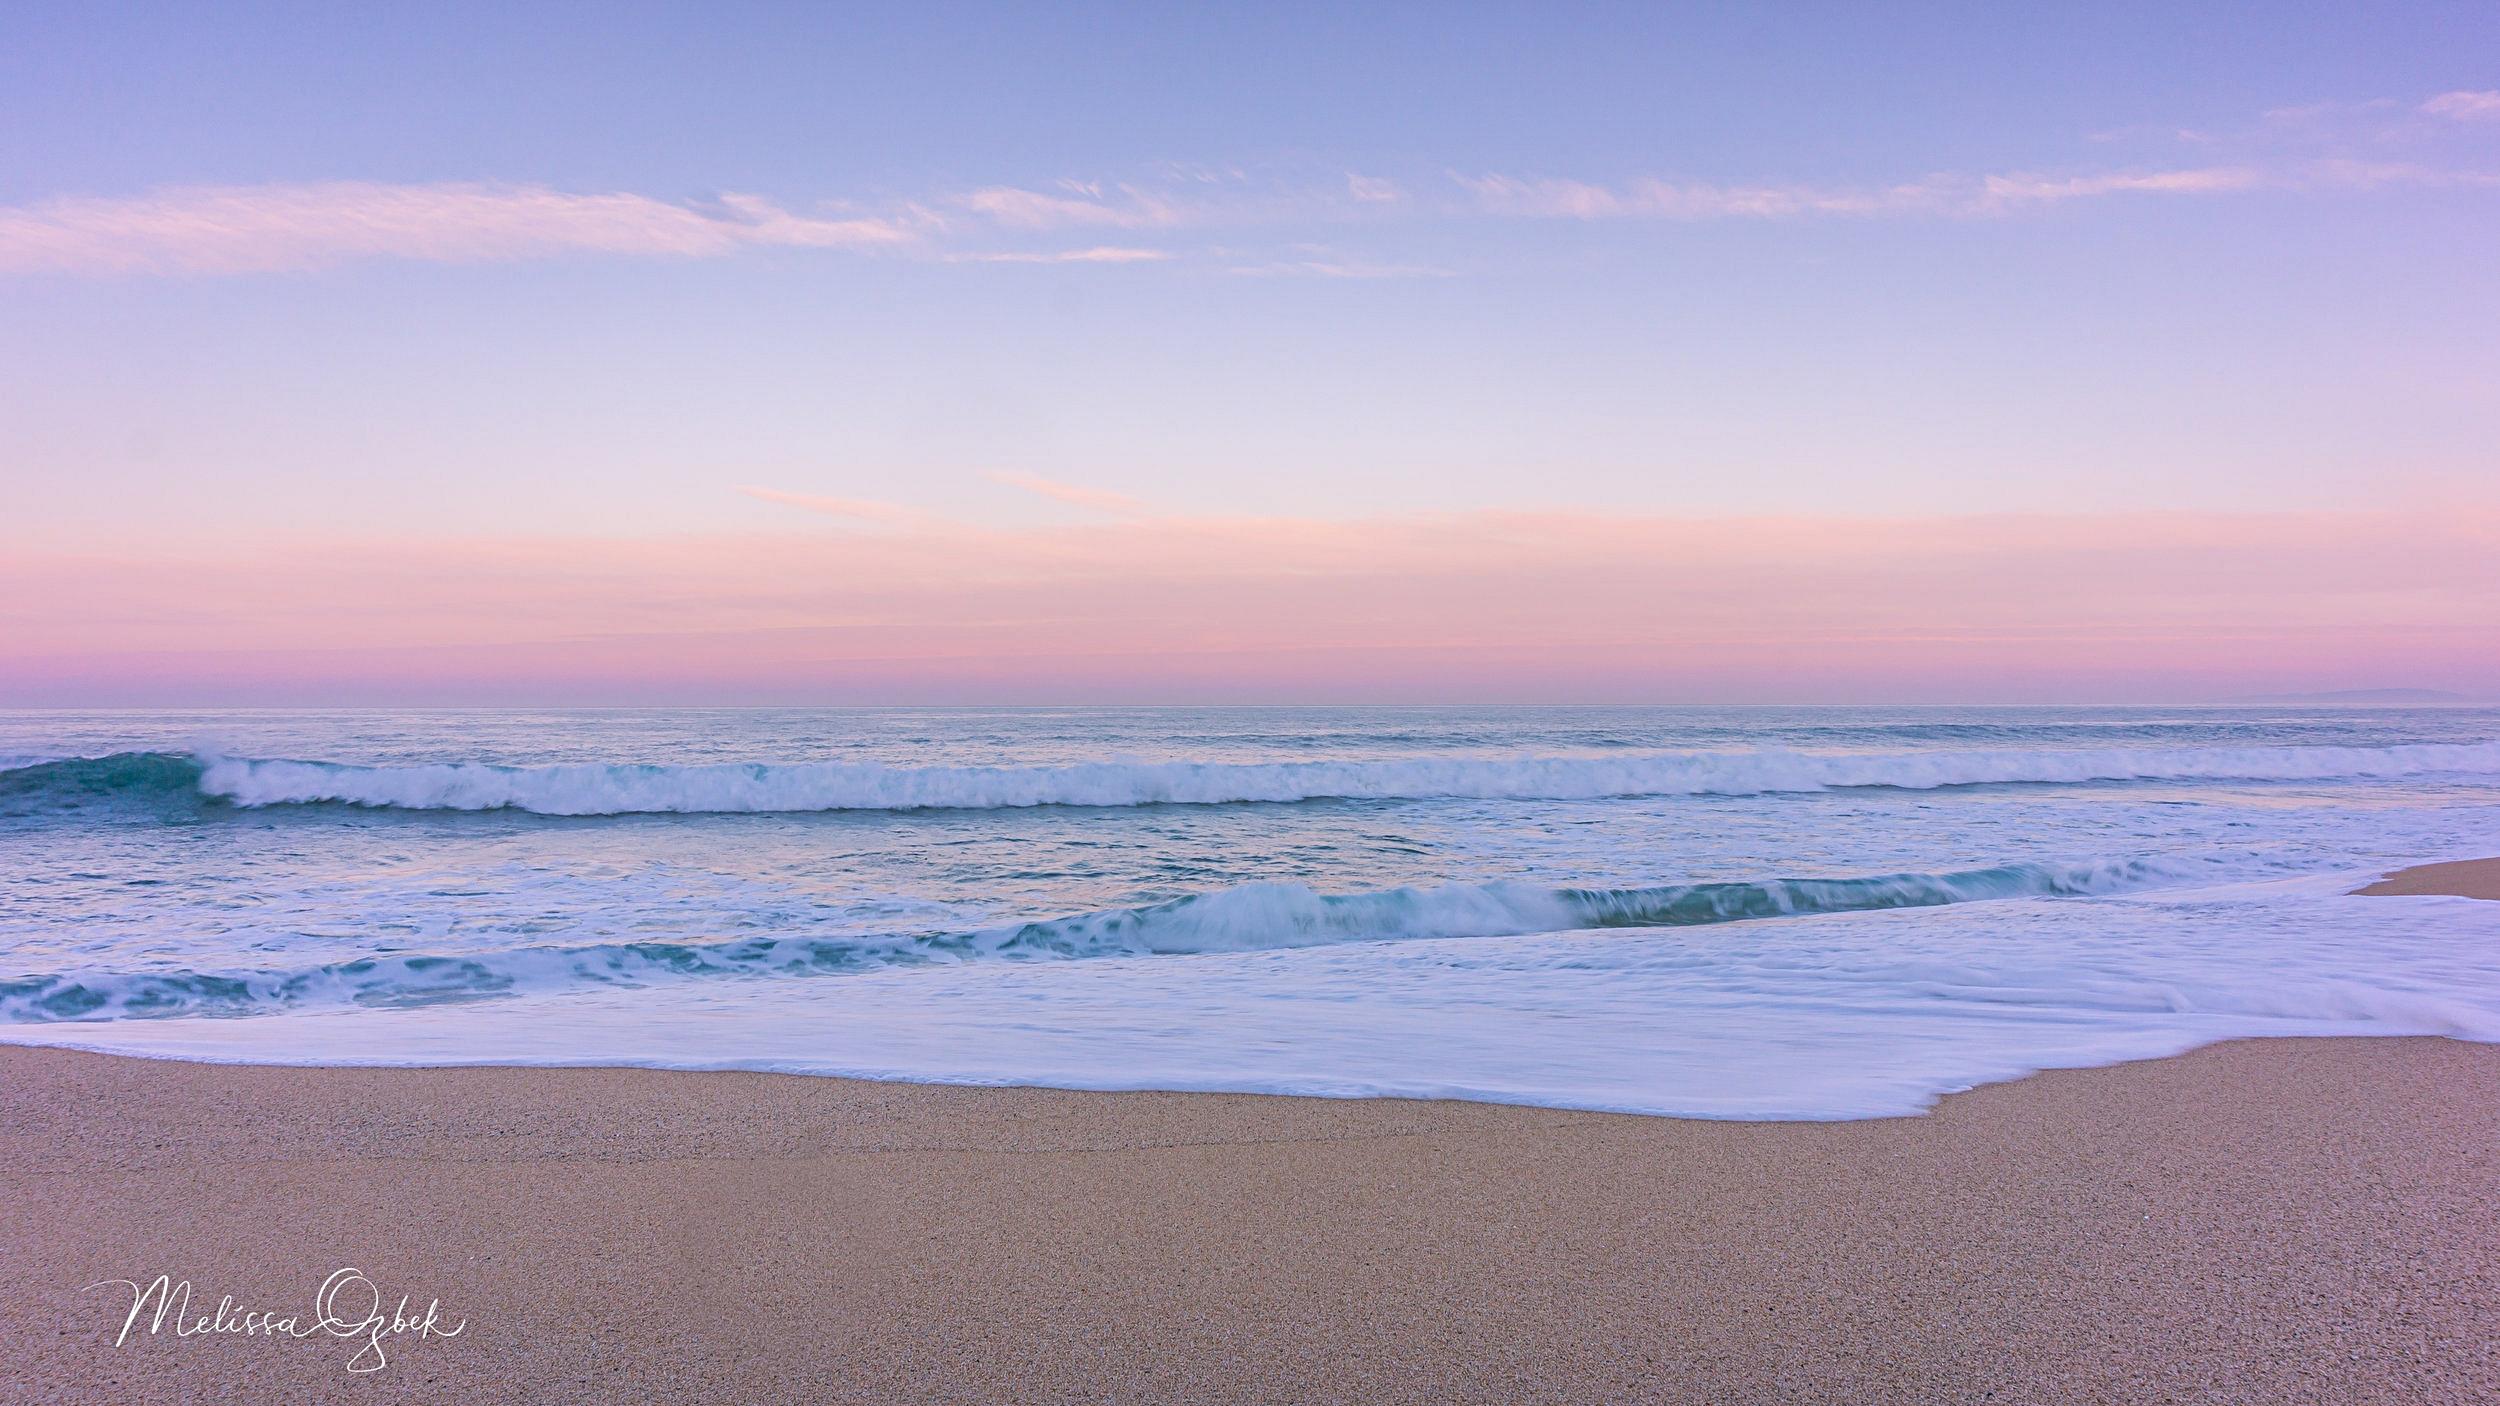 Sunrise at Montara Beach, Valentine's Day 2018